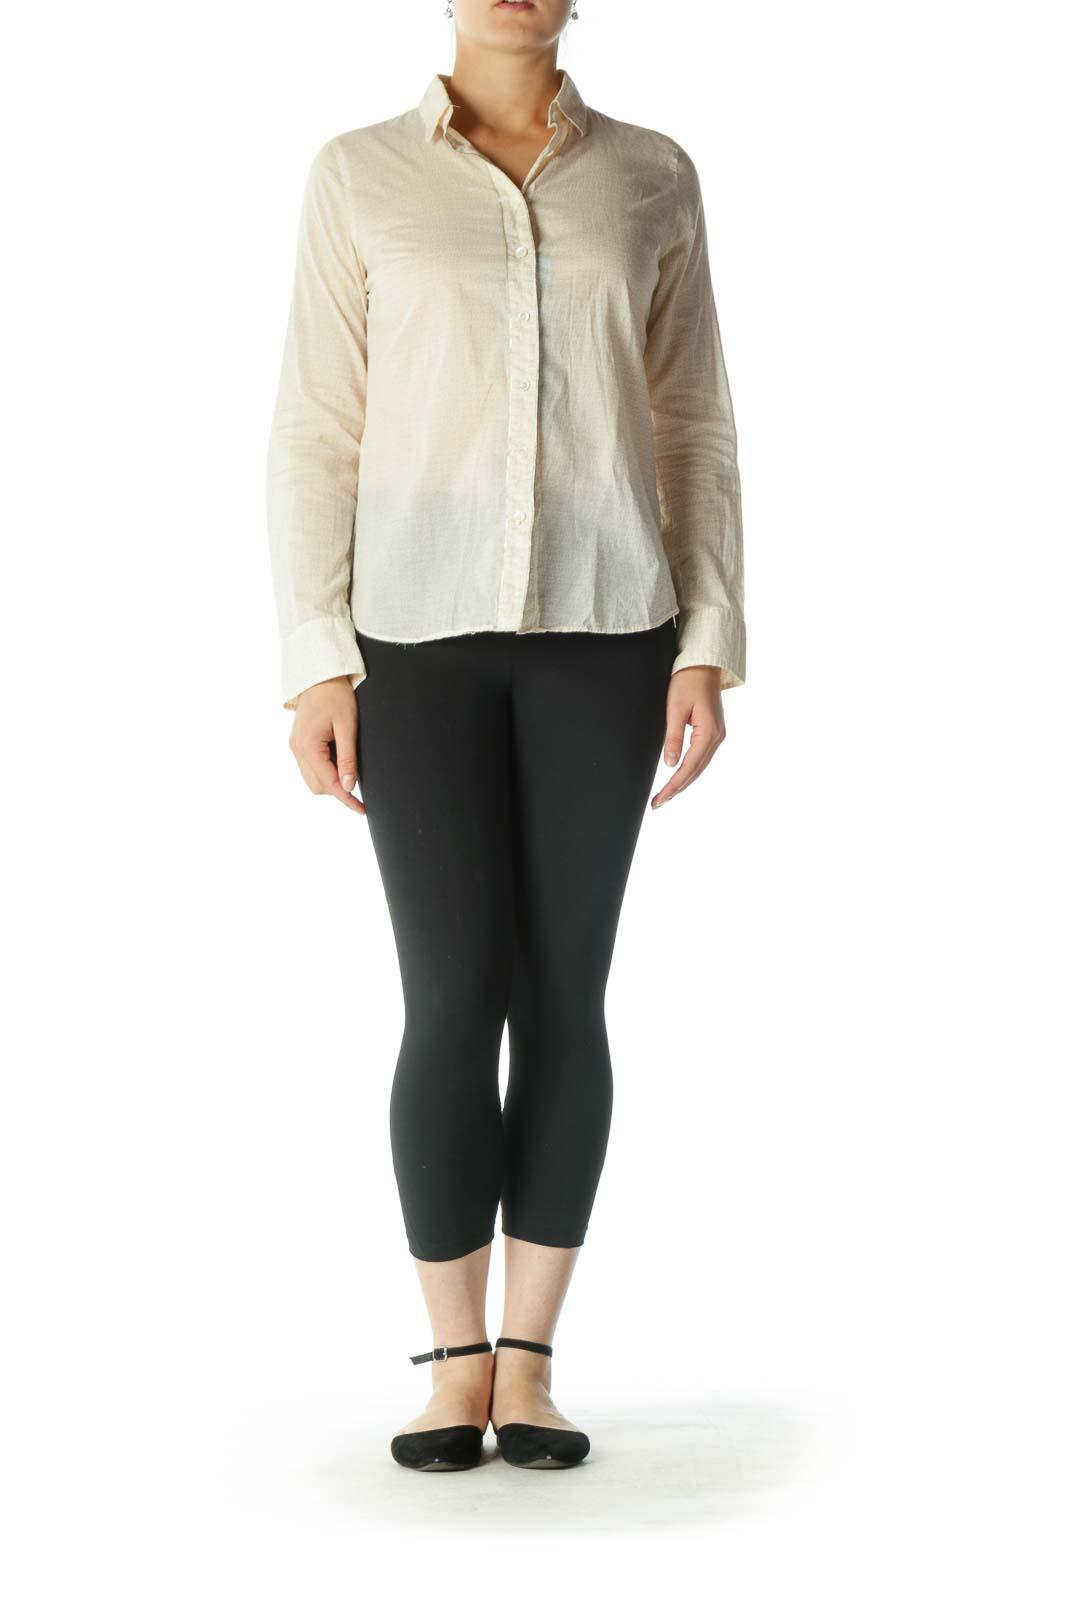 Beige Cream Silver Trim 100% Cotton Print Shirt